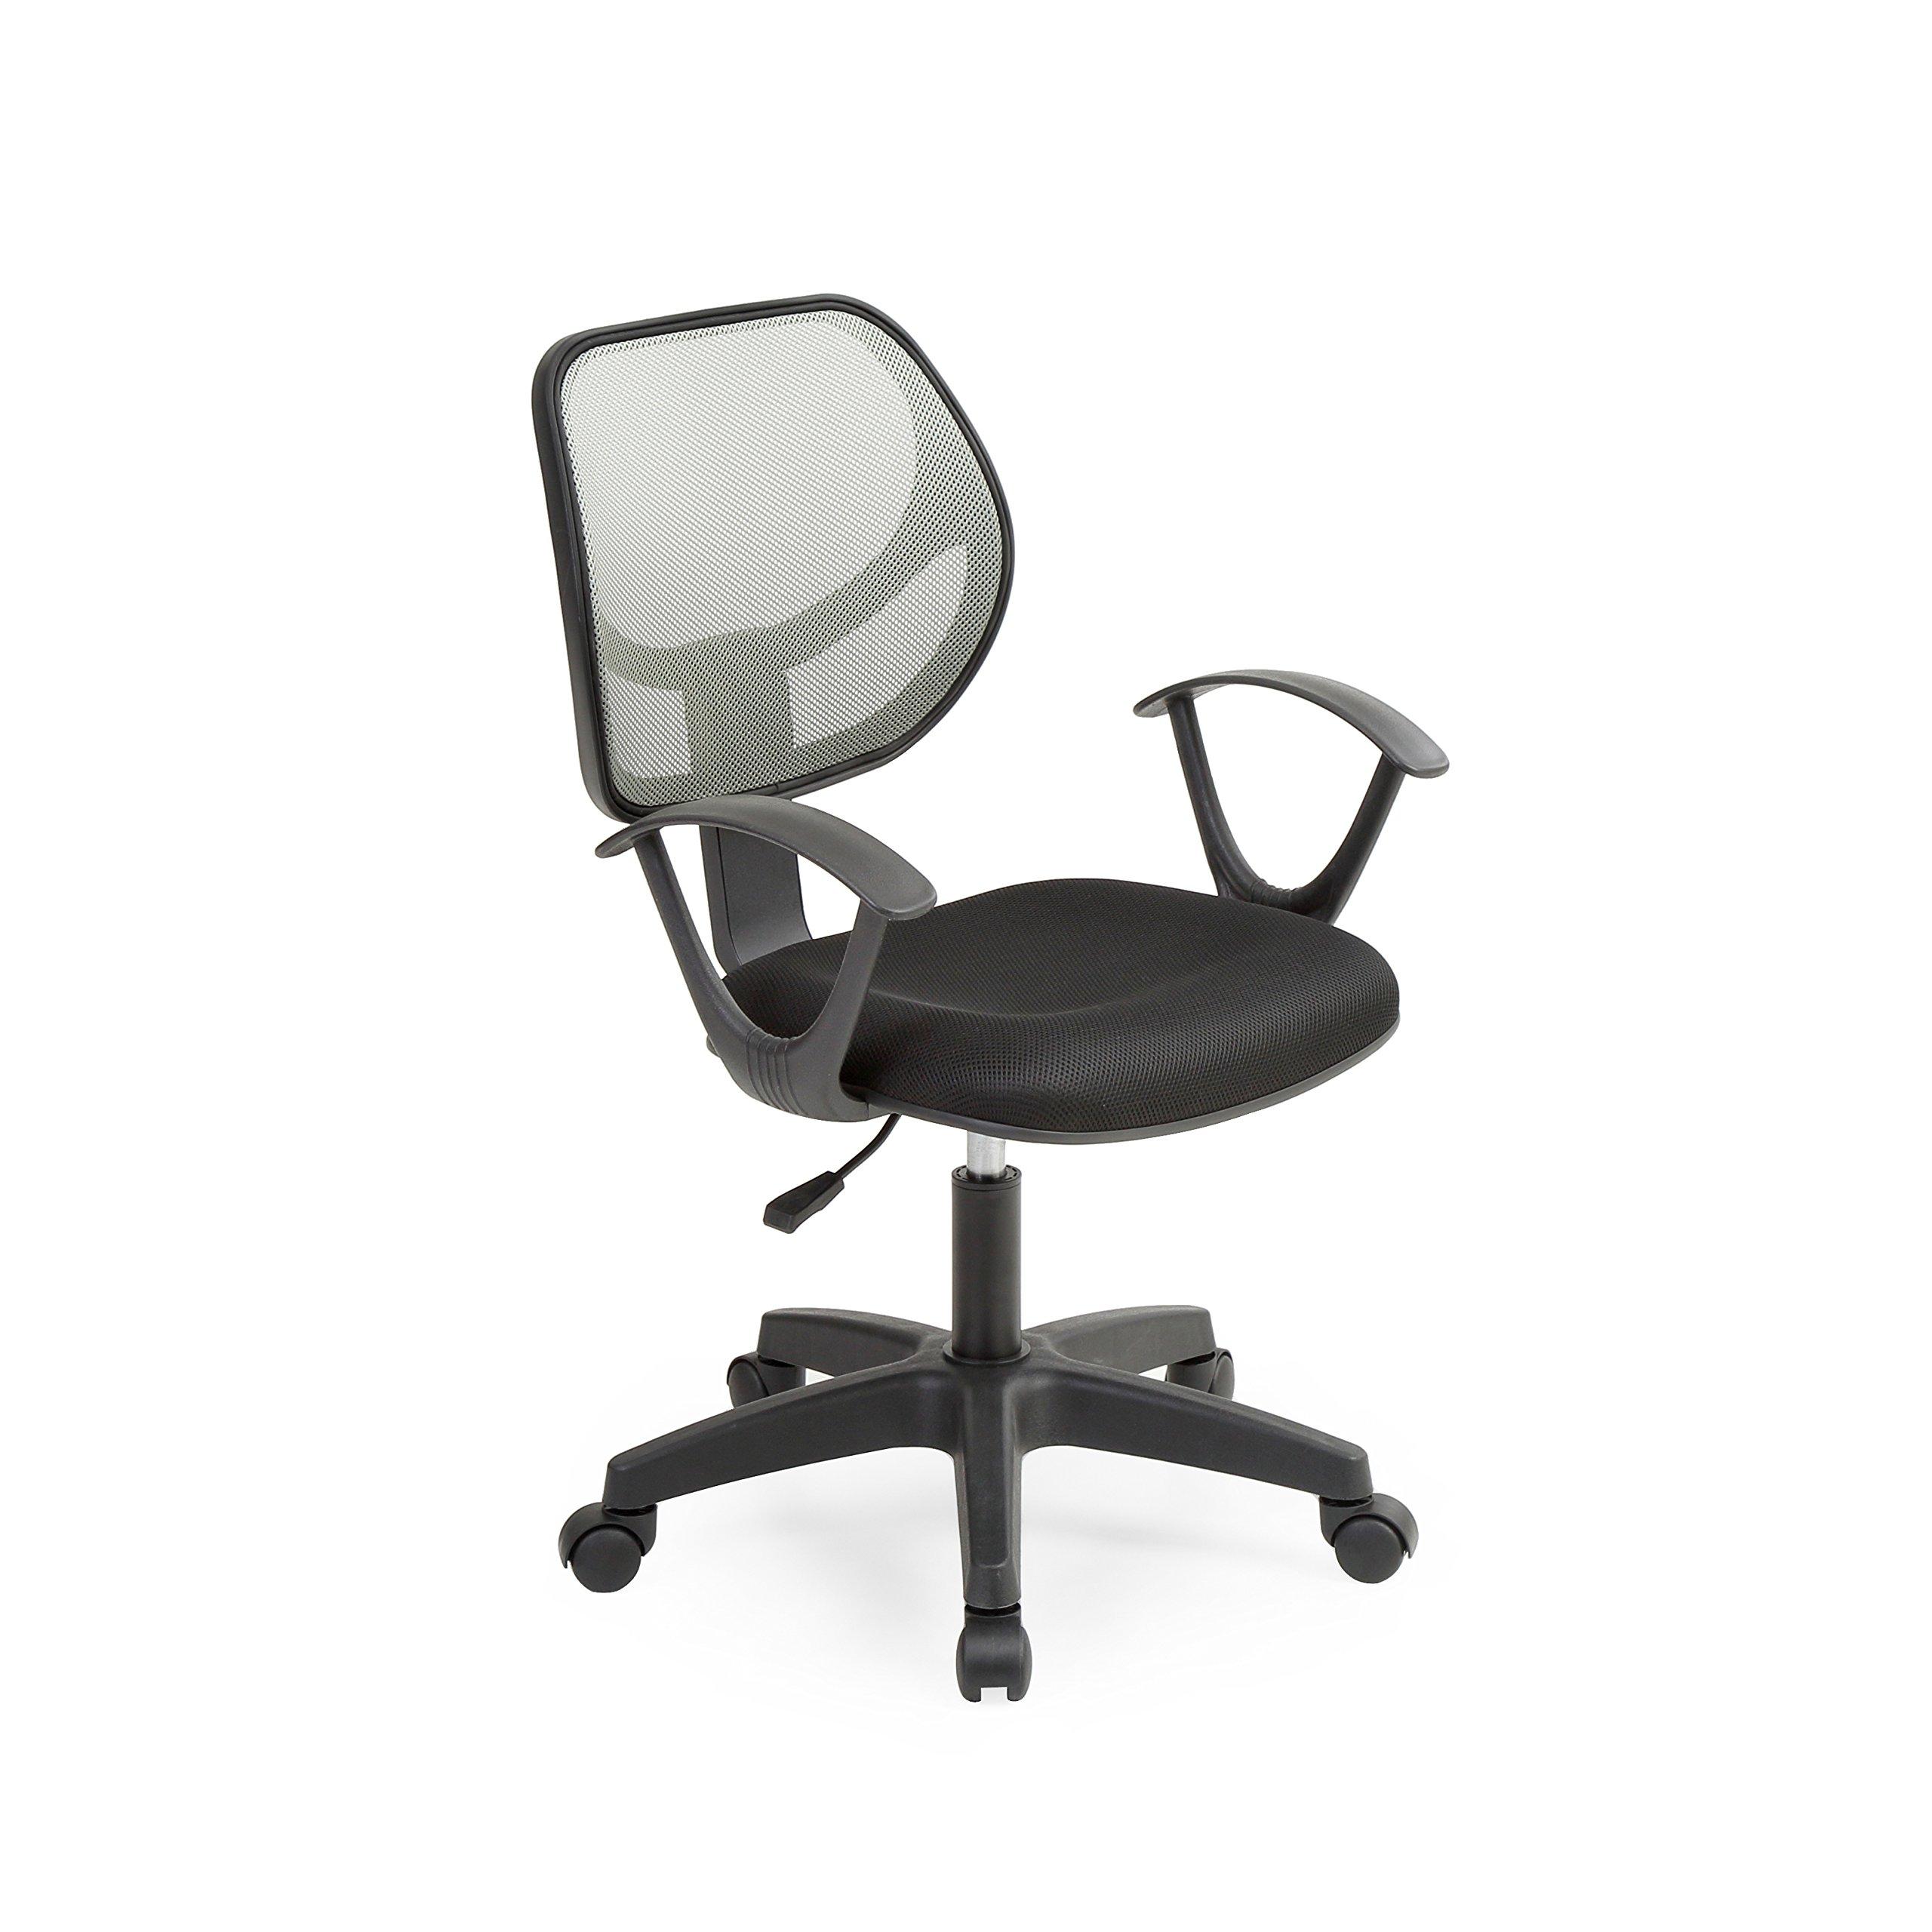 HODEDAH IMPORT Hodedah Mesh, Mid-Back, Adjustable Height, Swiveling Task Chair with Padded Seat in Grey